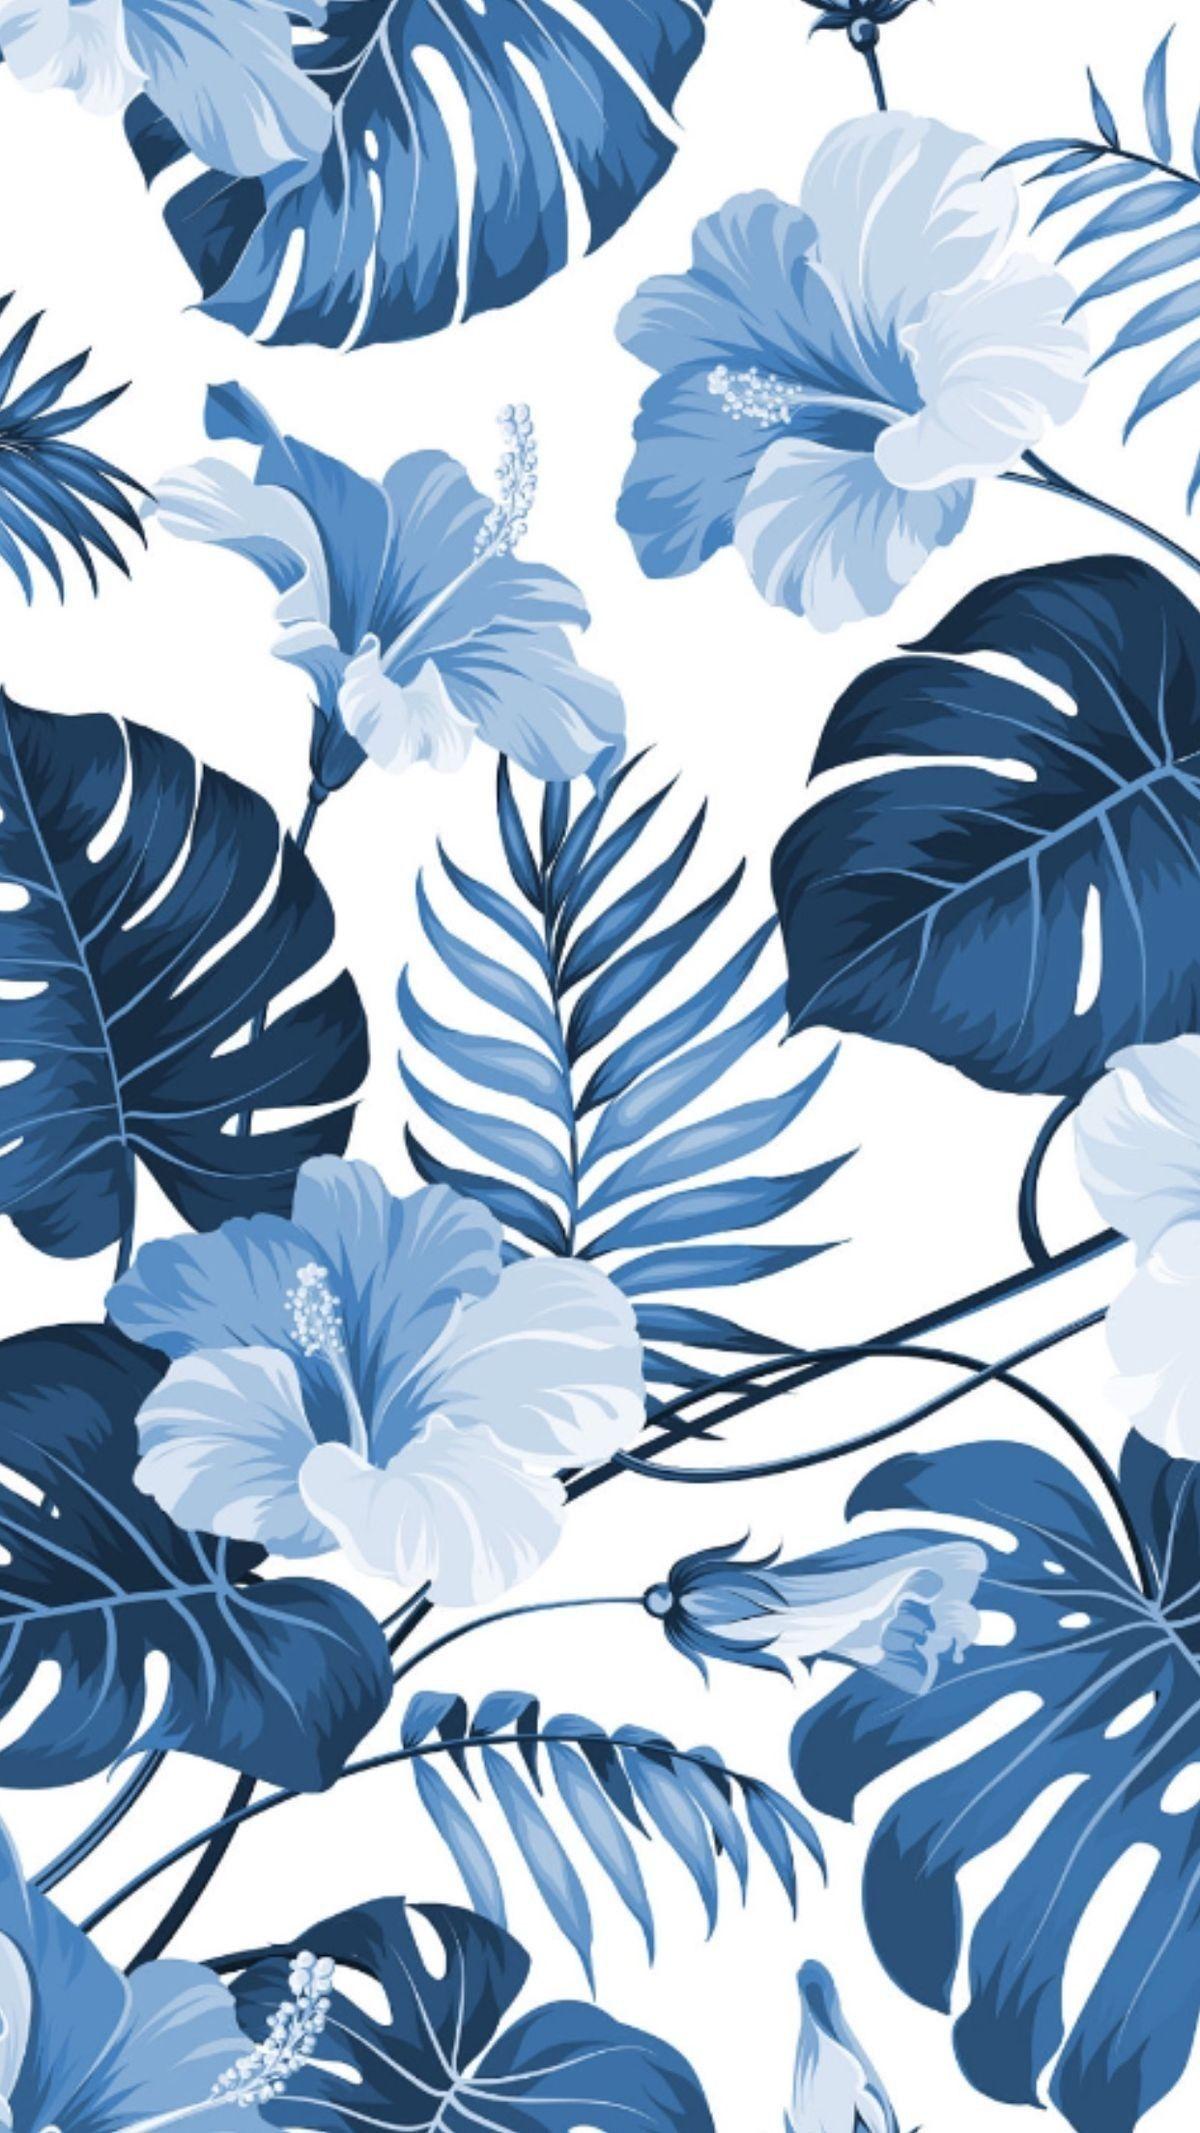 Pin By Wan Khadijah On Floral Wallpapers Watercolor Wallpaper